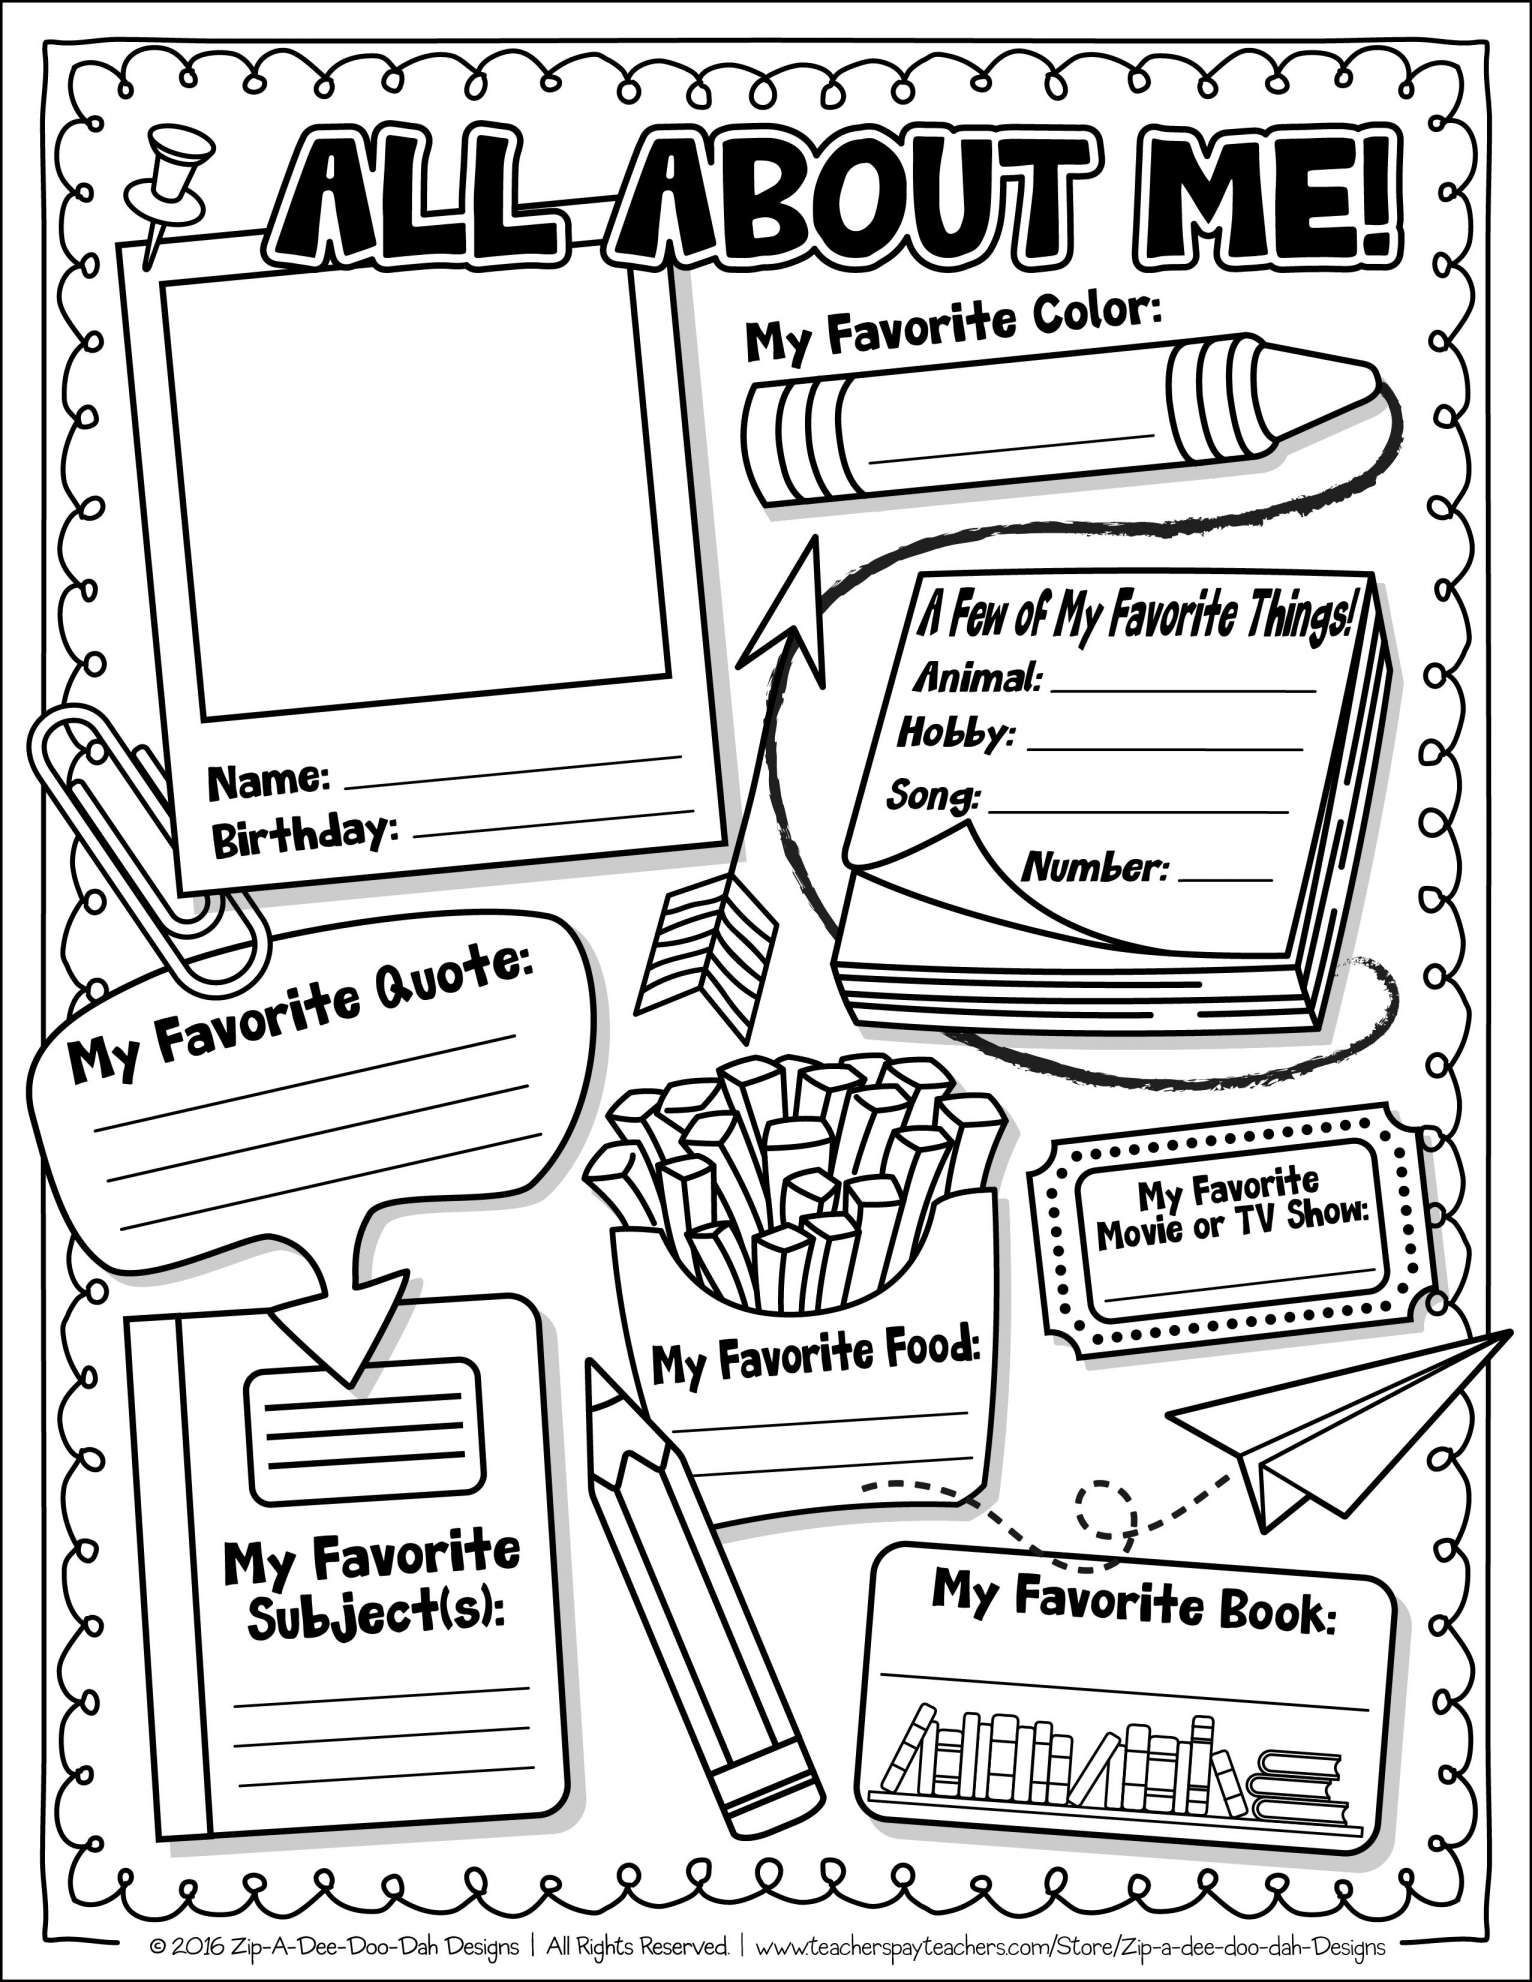 All About Me Worksheet 7 All About Me Worksheet 4th Grade Free Grade